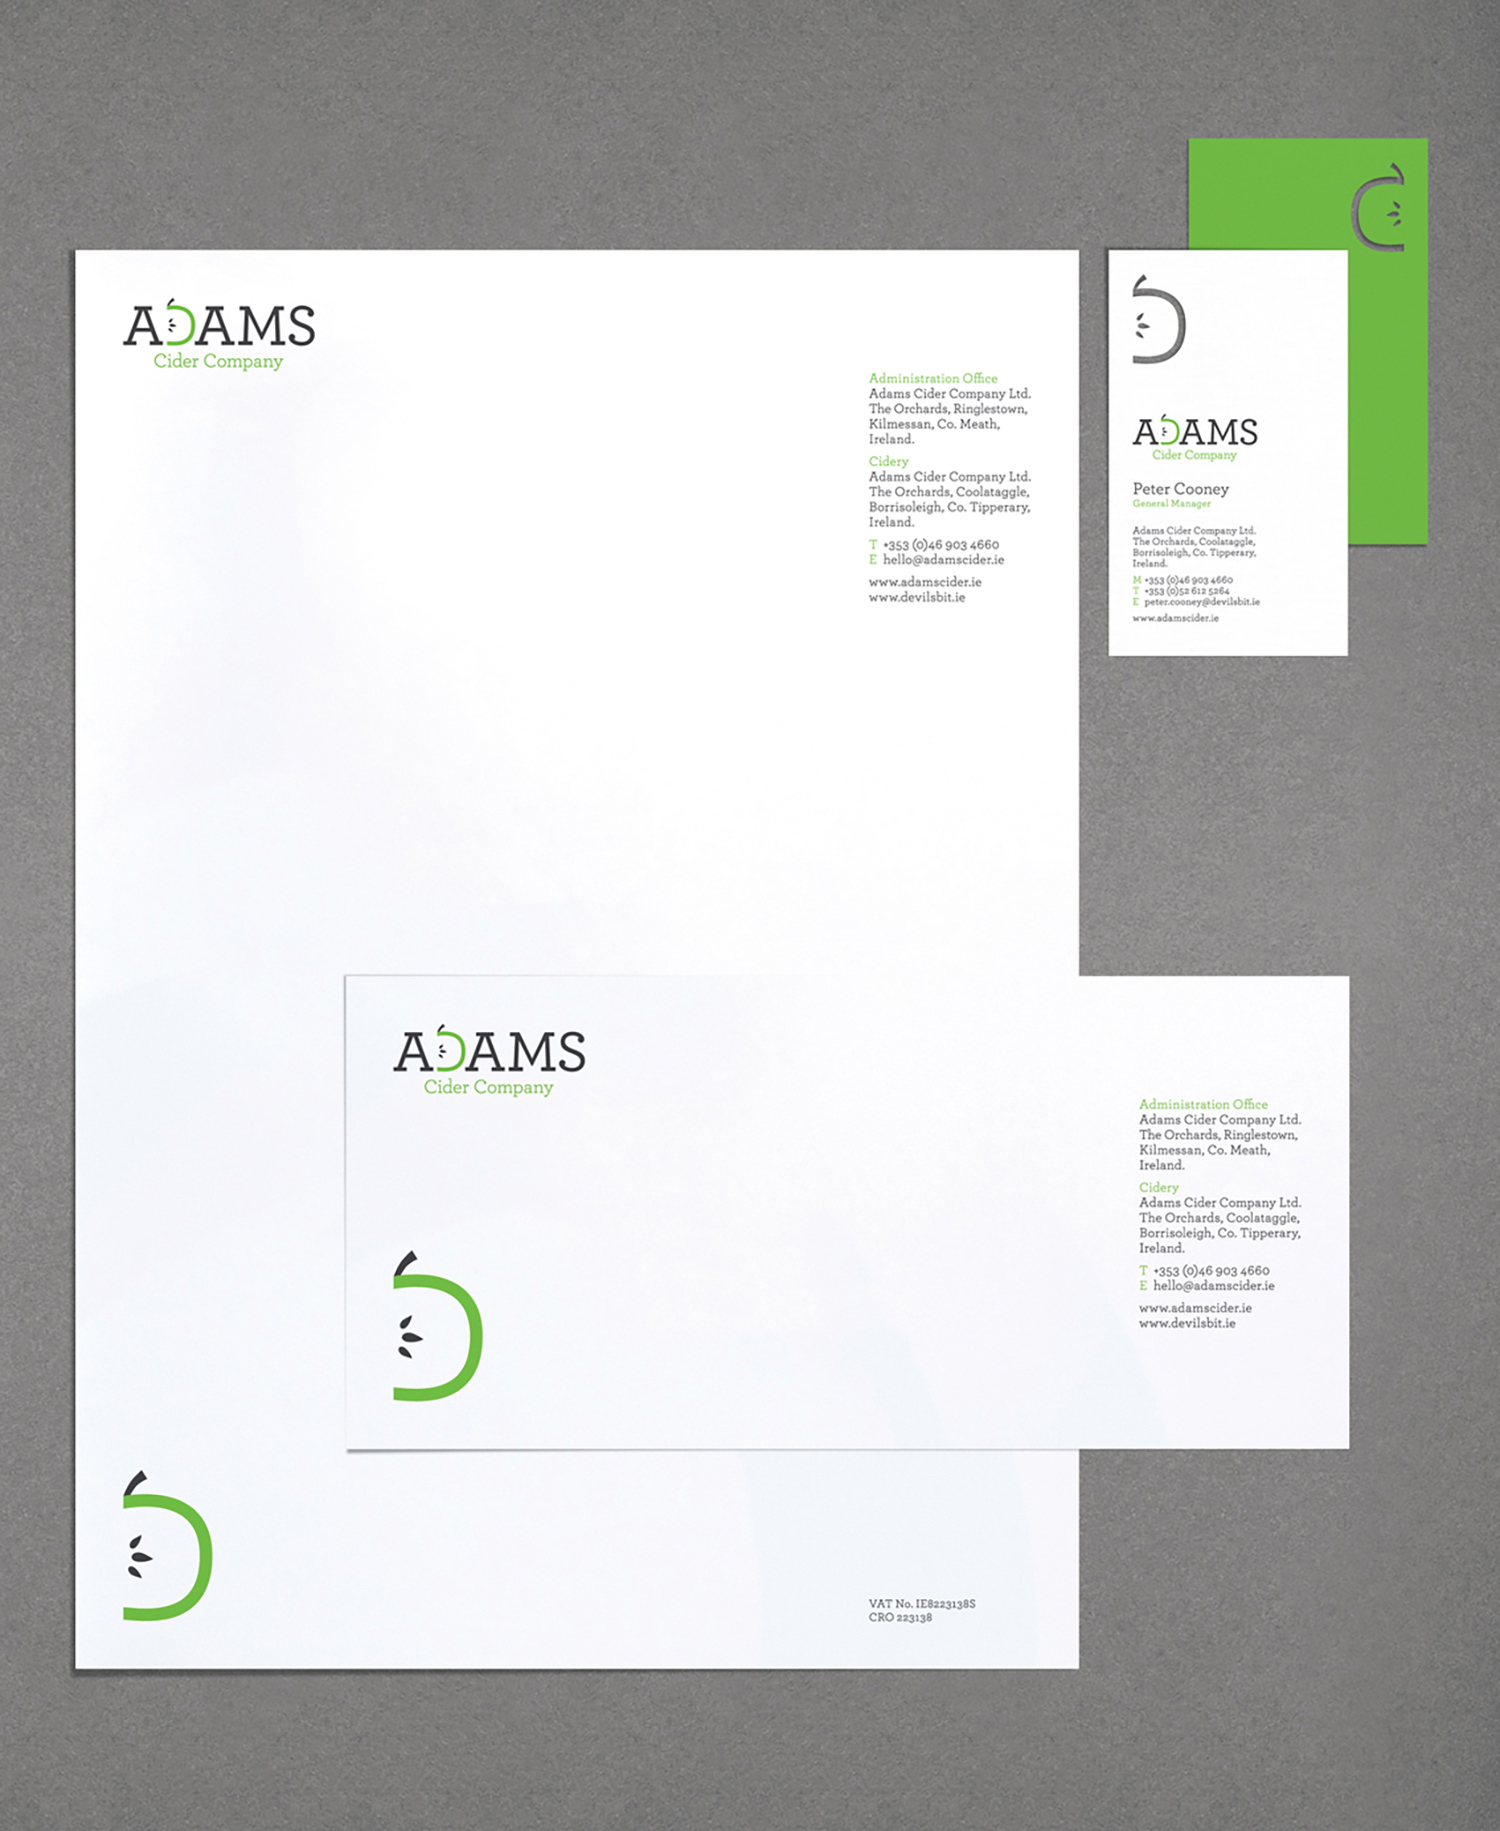 Adams+1.jpg